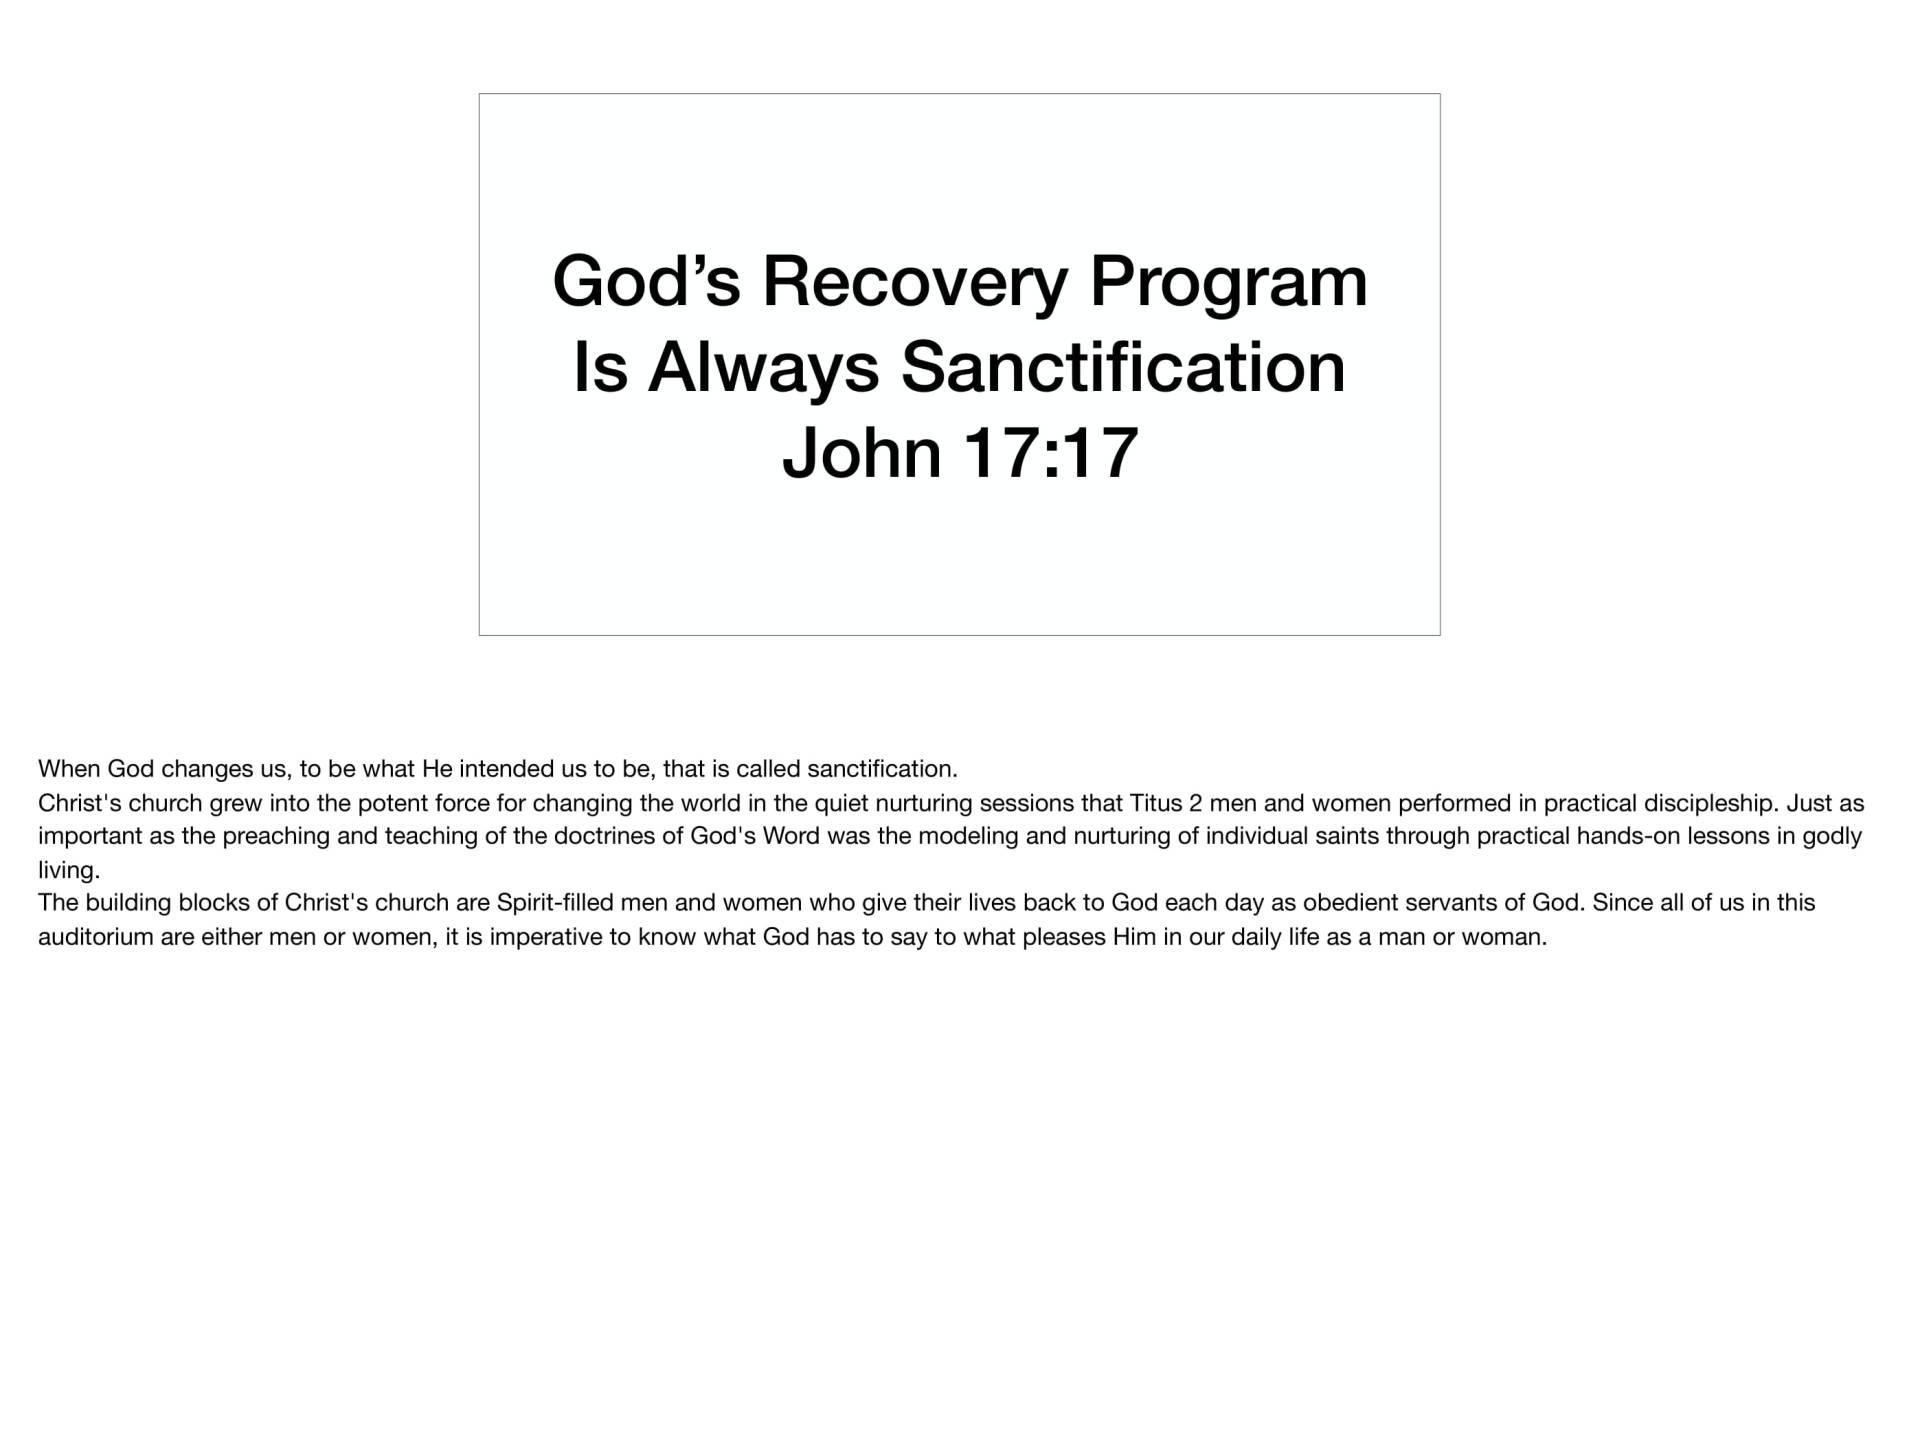 LGI-01 - God's Recovery Program Is Sanctification-14